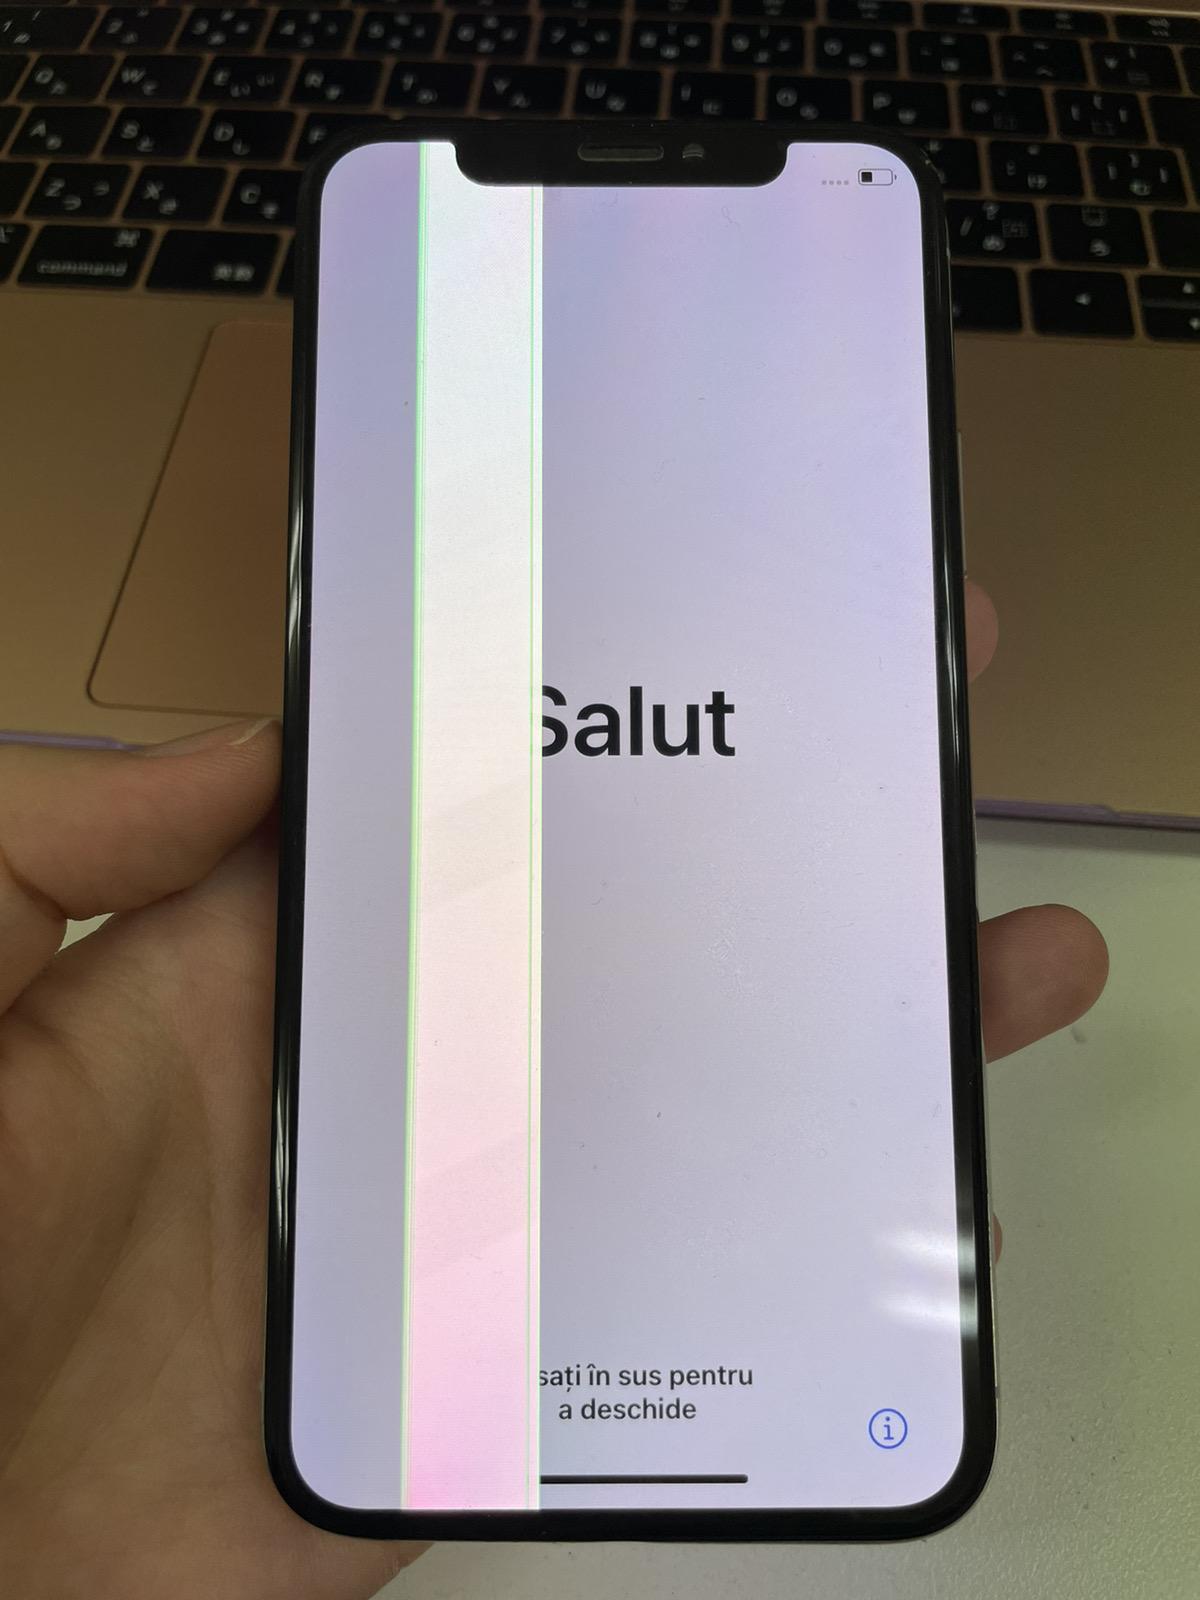 IPhoneX シルバー 256GB SoftBank○ 本体のみ 液晶不良 中古品